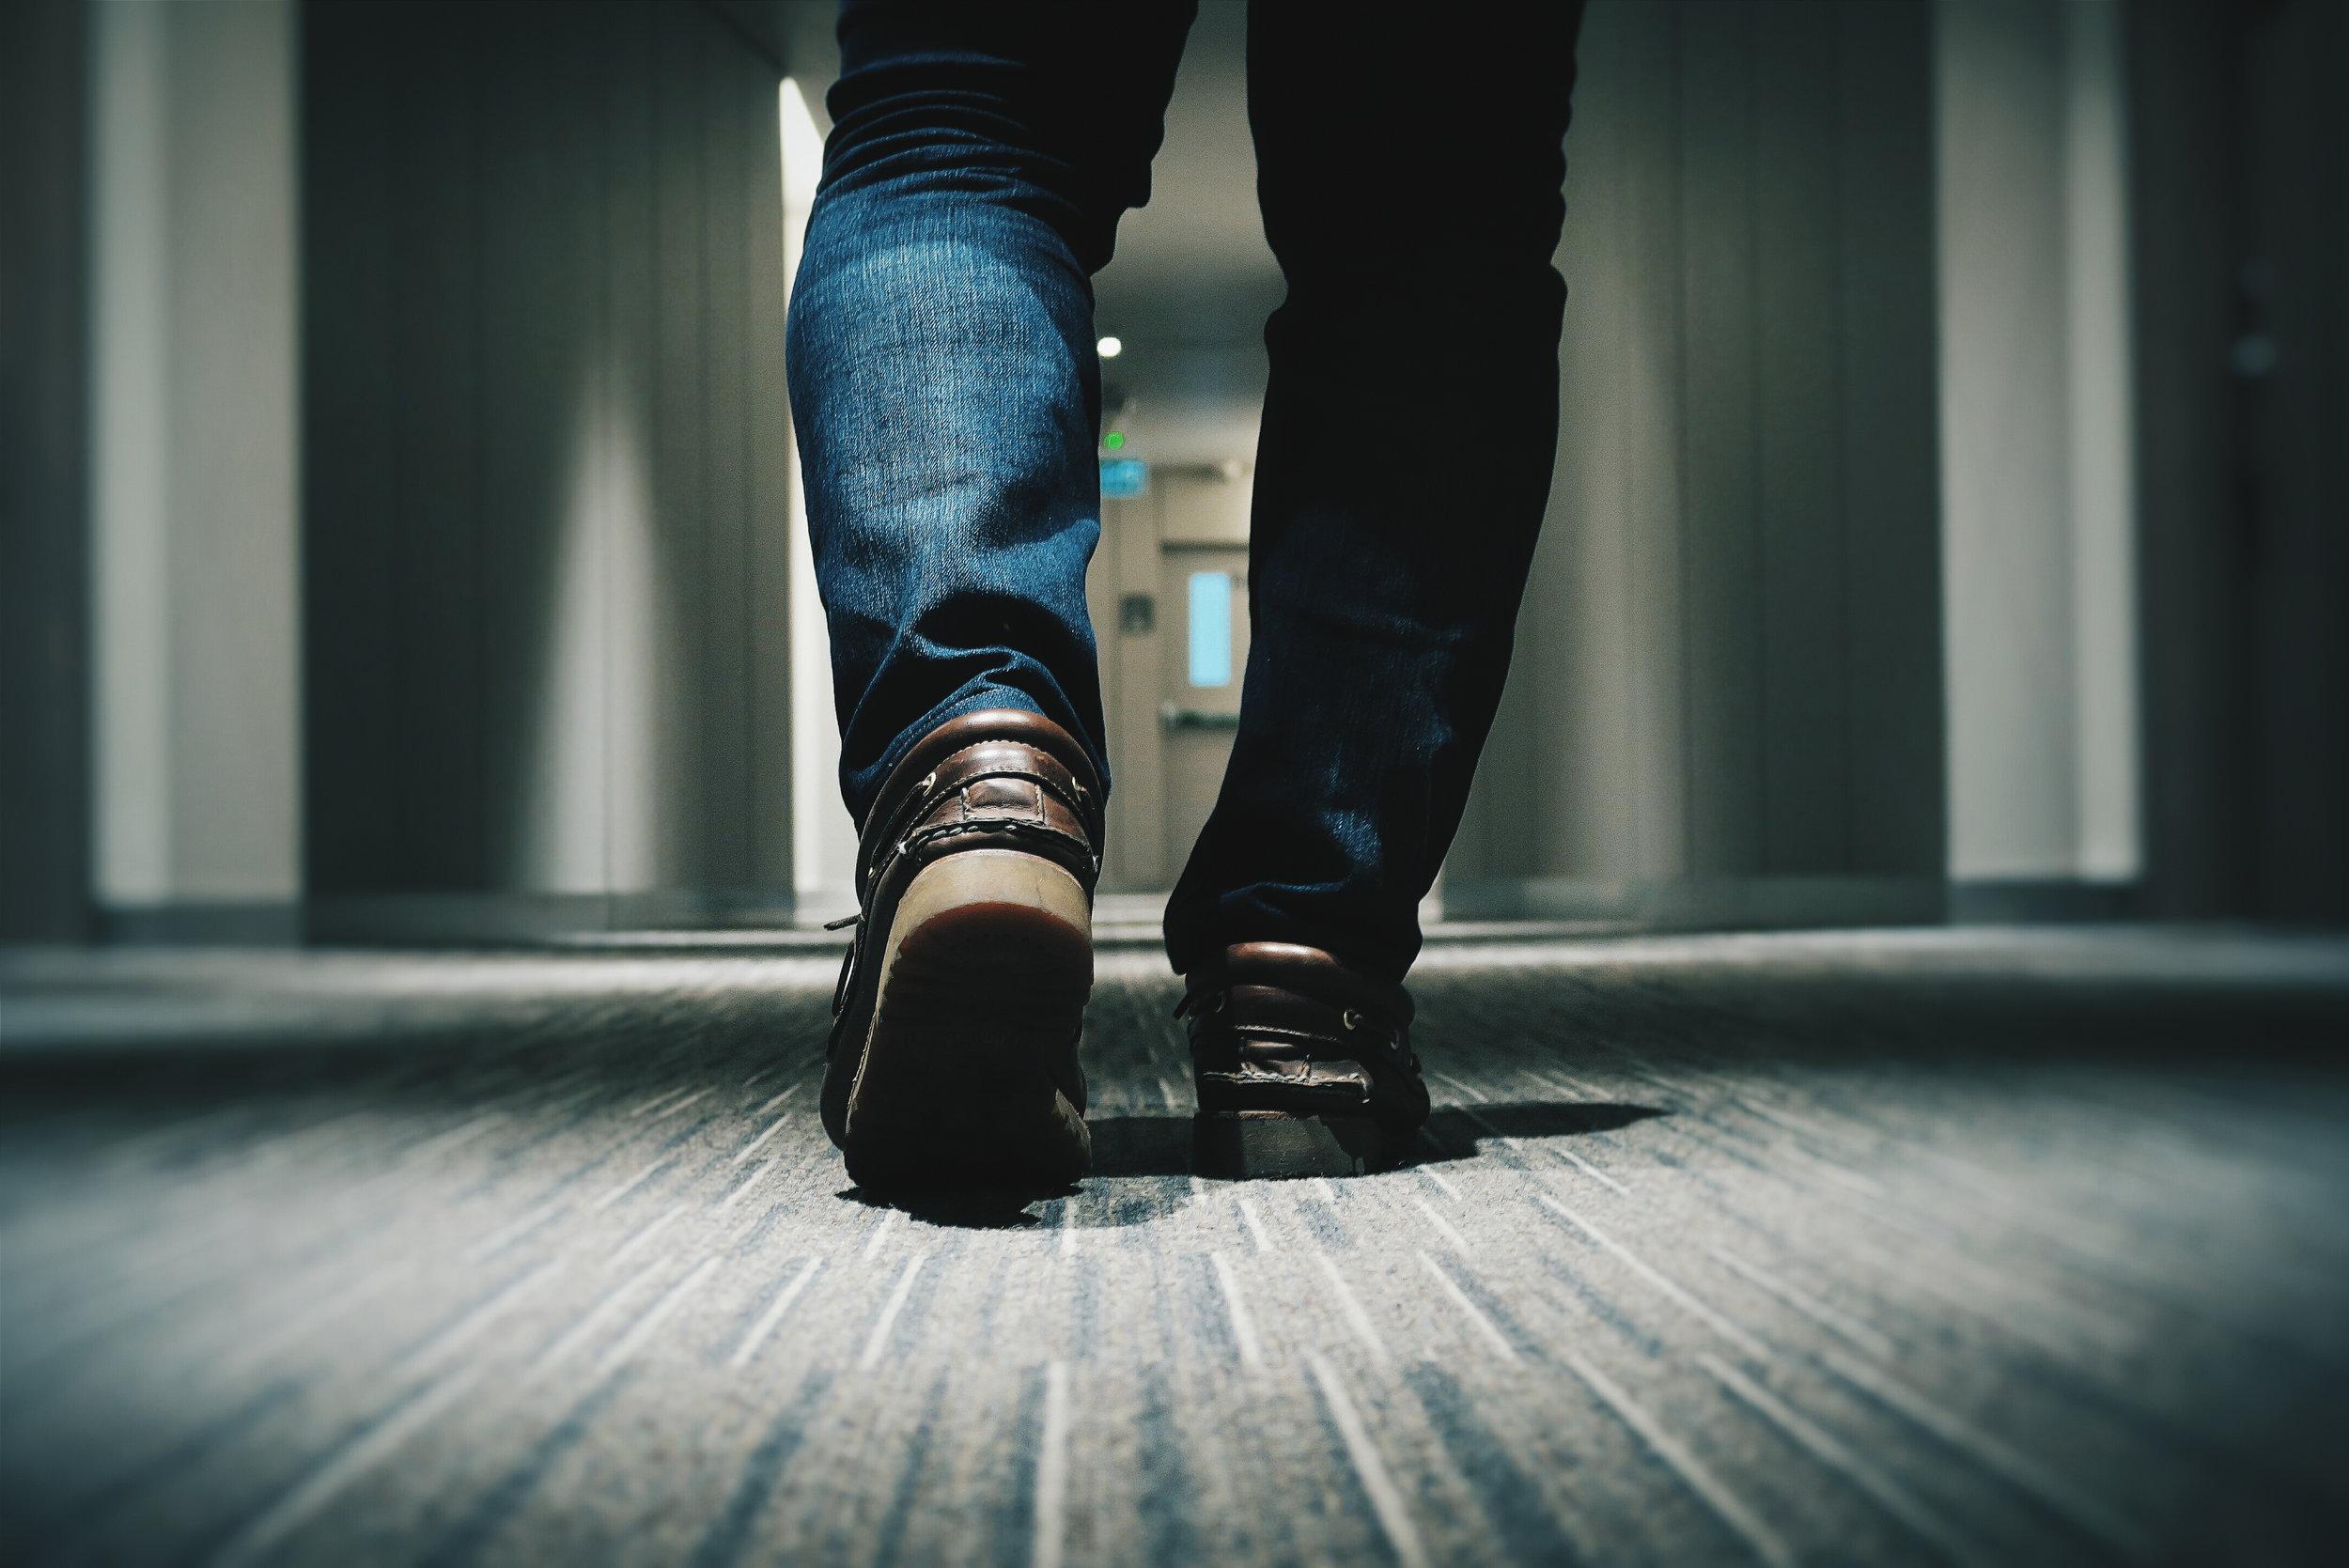 Flooring Estimates in Ontario | Rancho Cucamonga | Loma Linda | Redlands | Corona | Chino | Riverside | San Bernardino | Pomona | Fullerton | Orange | Anaheim | Tustin | Costa Mesa | Irvine | Cypress | Buena Park | Santa Ana | Cerritos